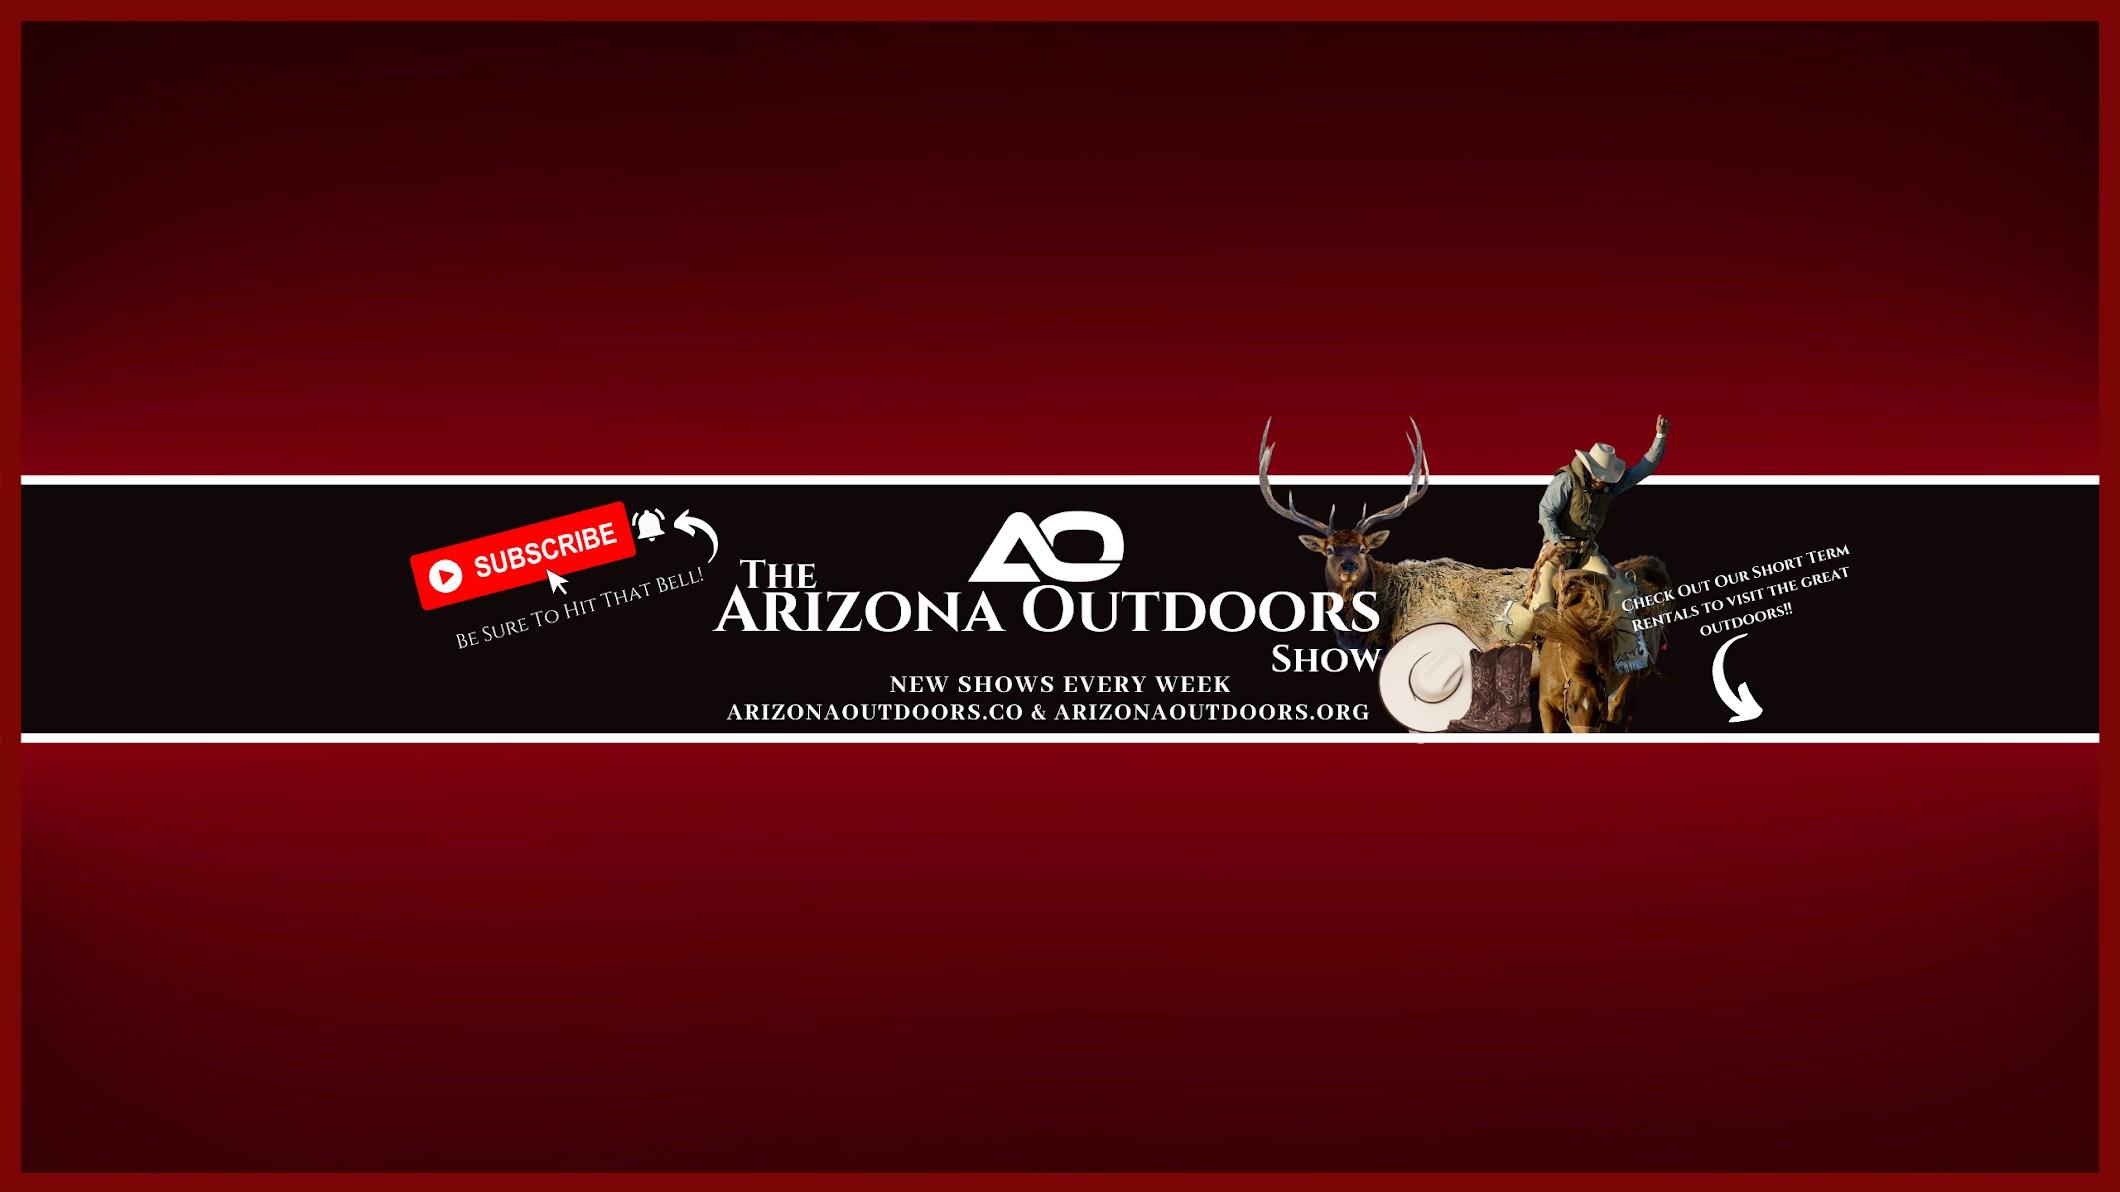 Arizona Outdoors Co.